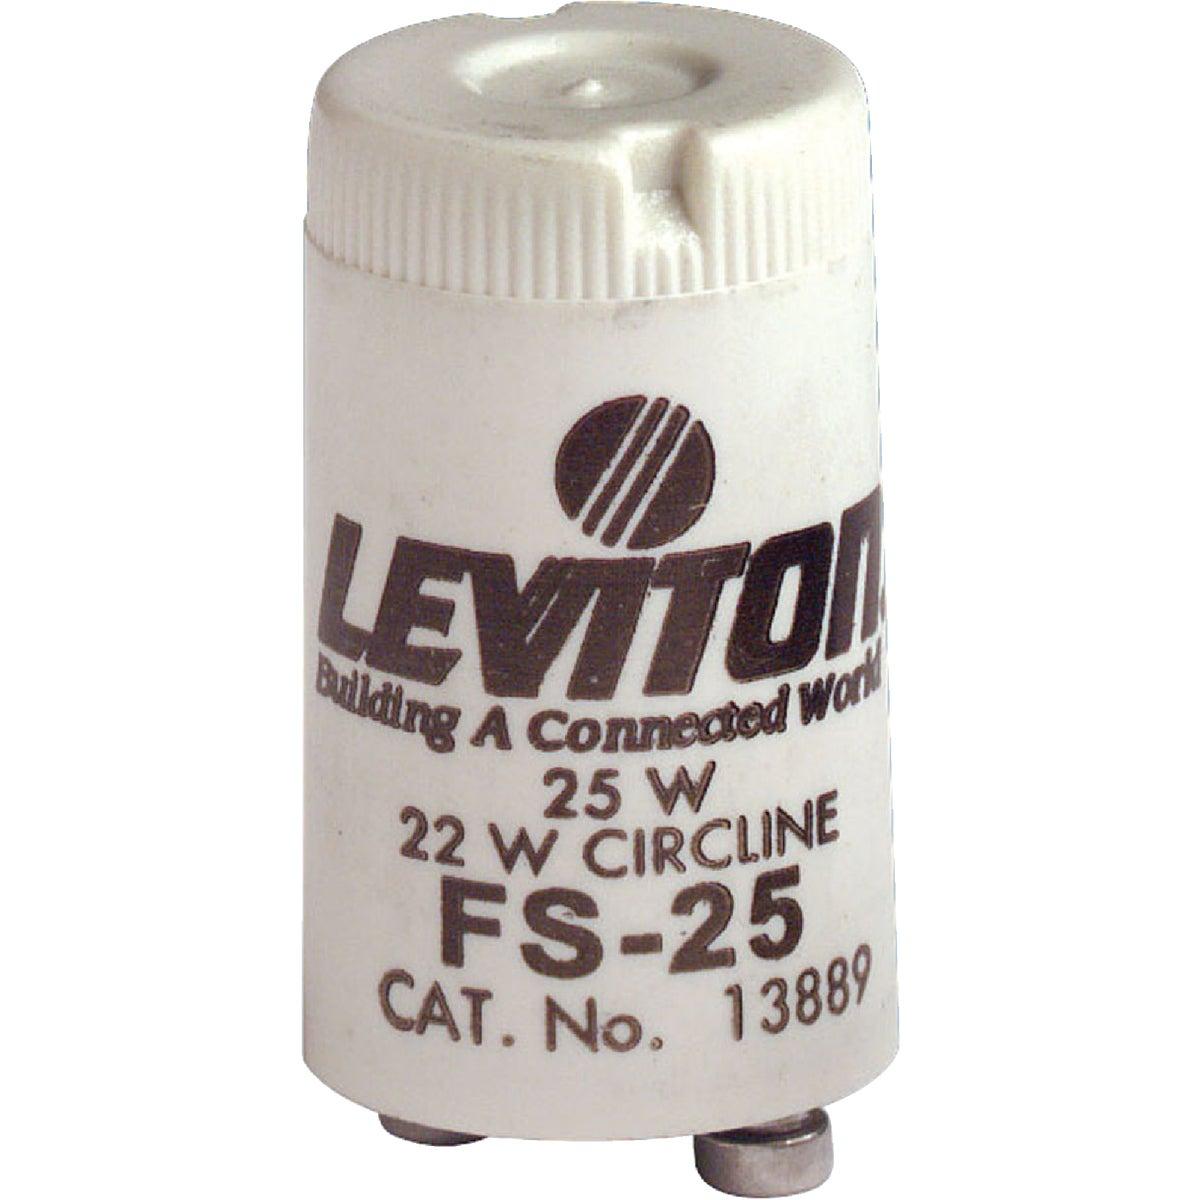 Leviton 22W/25W 2-Pin Circline Fluorescent Starter